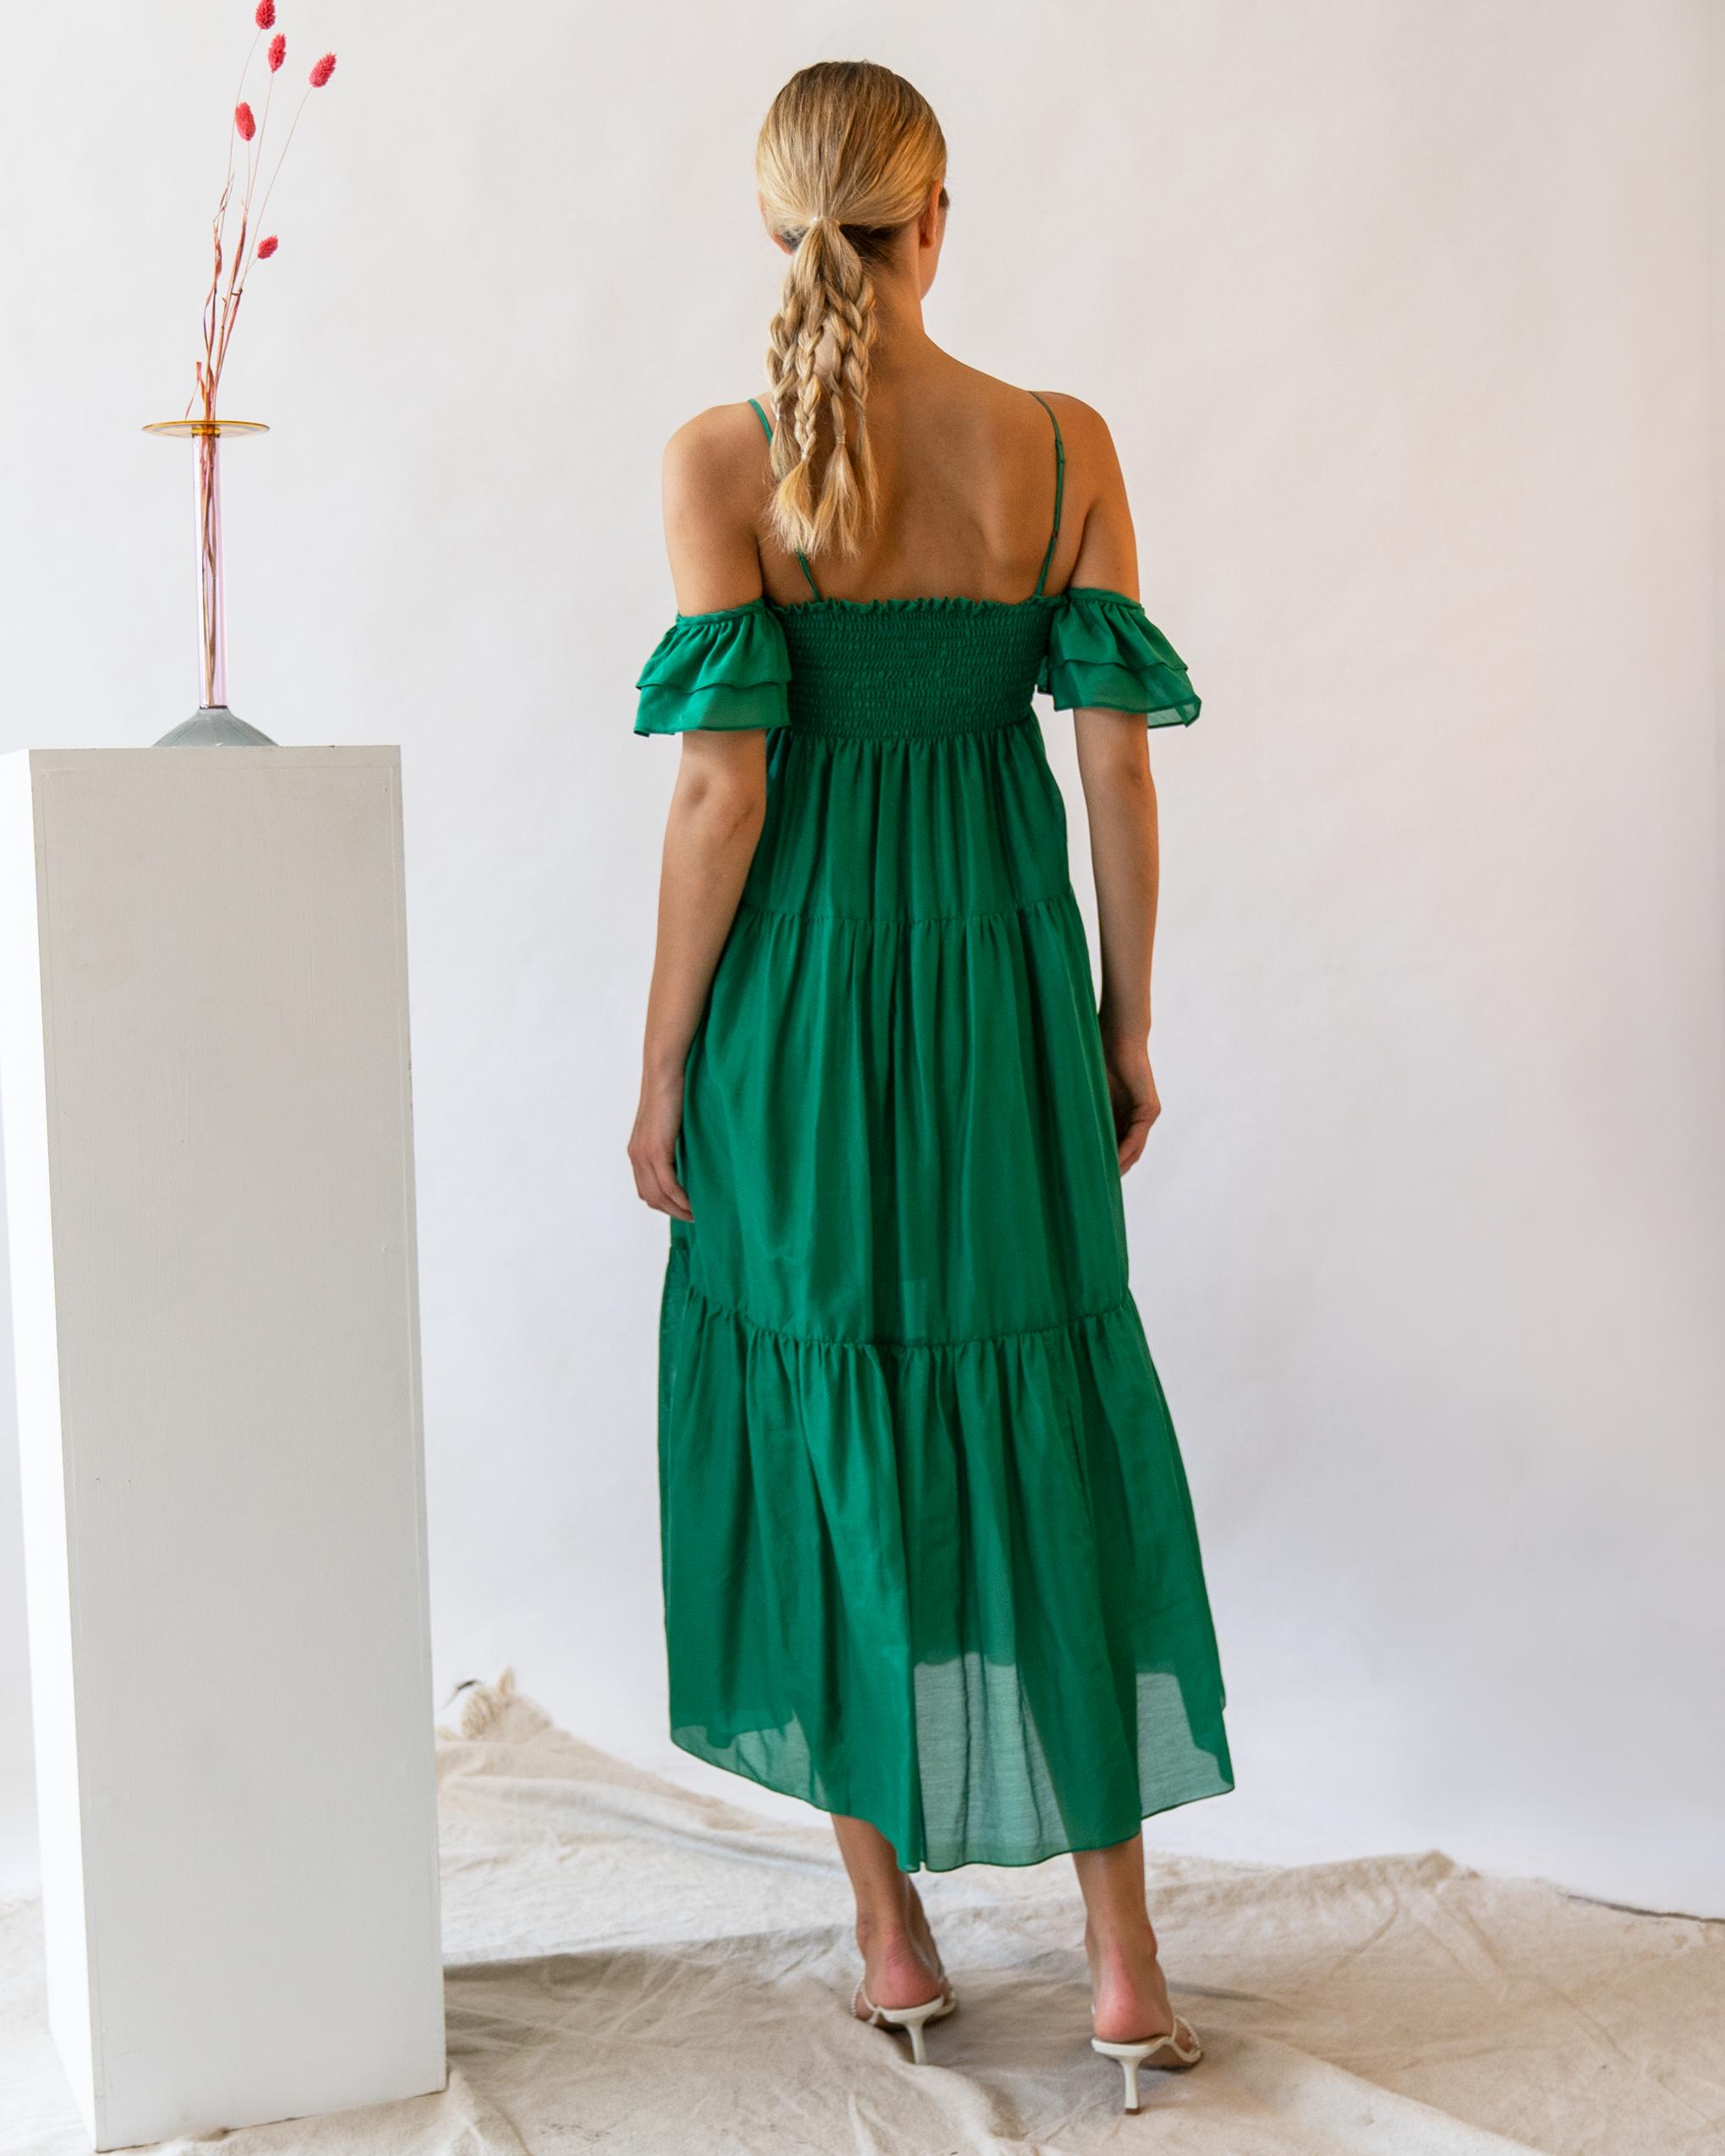 A woman is wearing green cotton-silk blend ruffle off-the-shoulder dress.